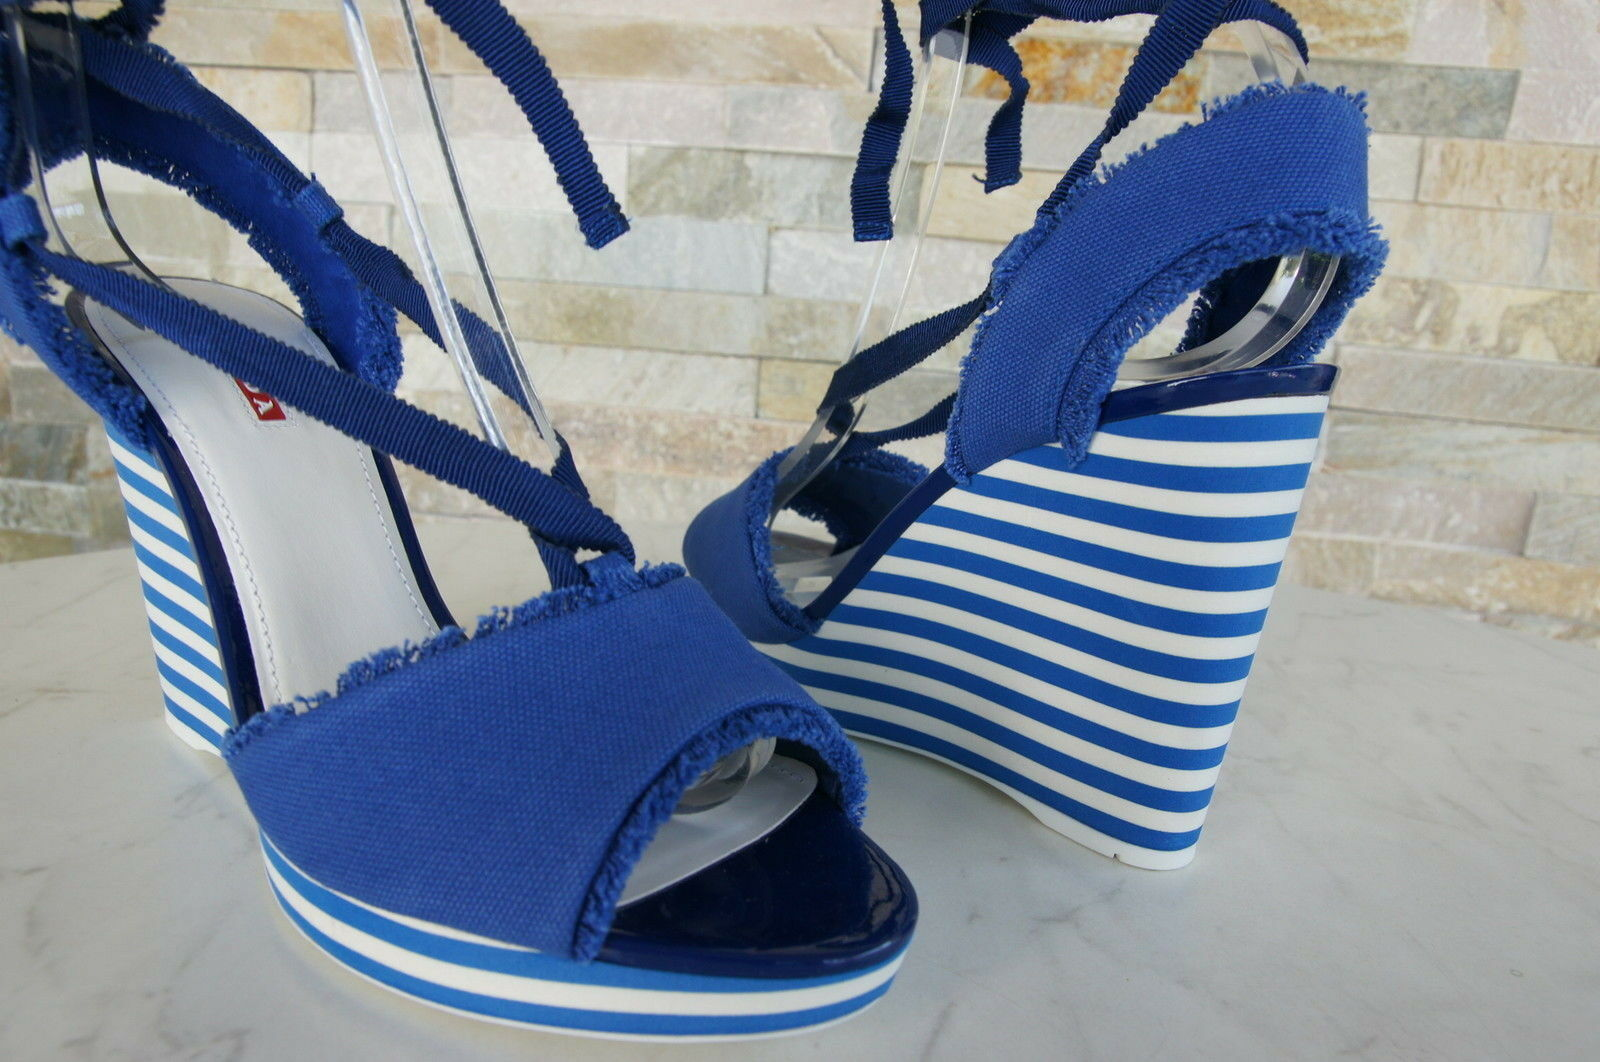 PRADA Gr 40 Keil Plateau Sandaletten Sandales Sandales Sandales Schuhe kobalt blau Blau NEU 82f3e5